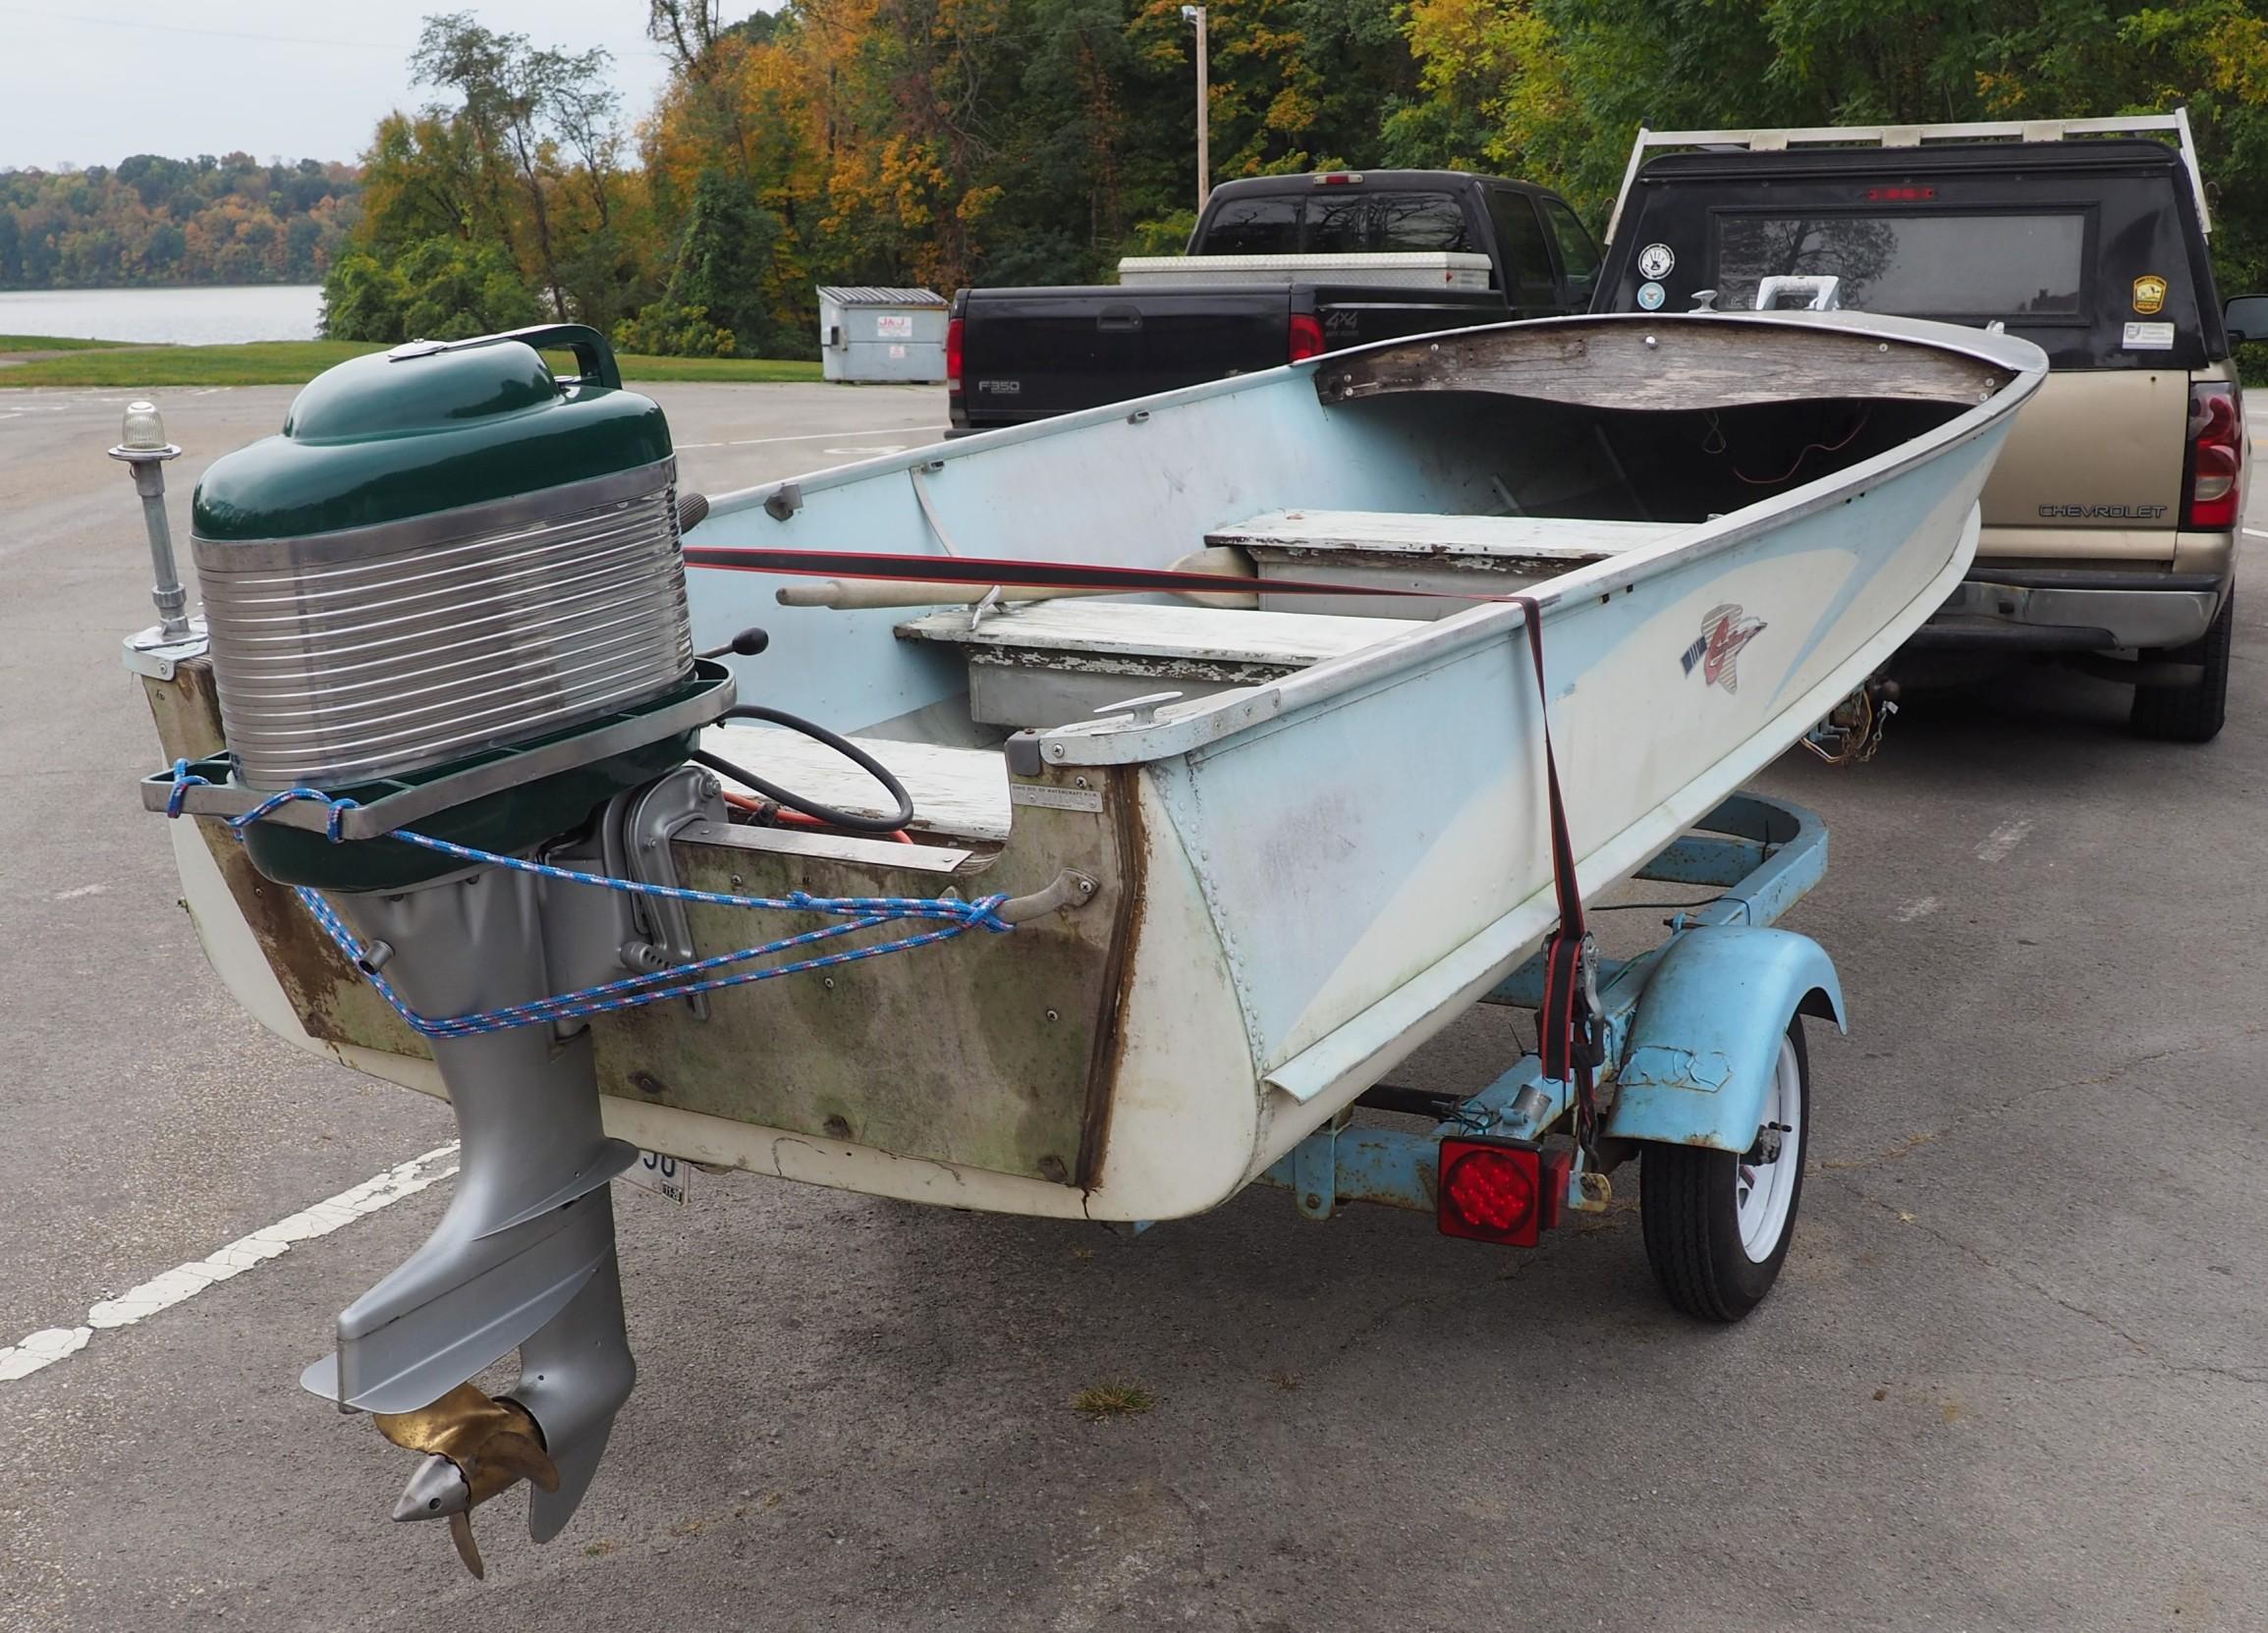 Jay's boat and motor